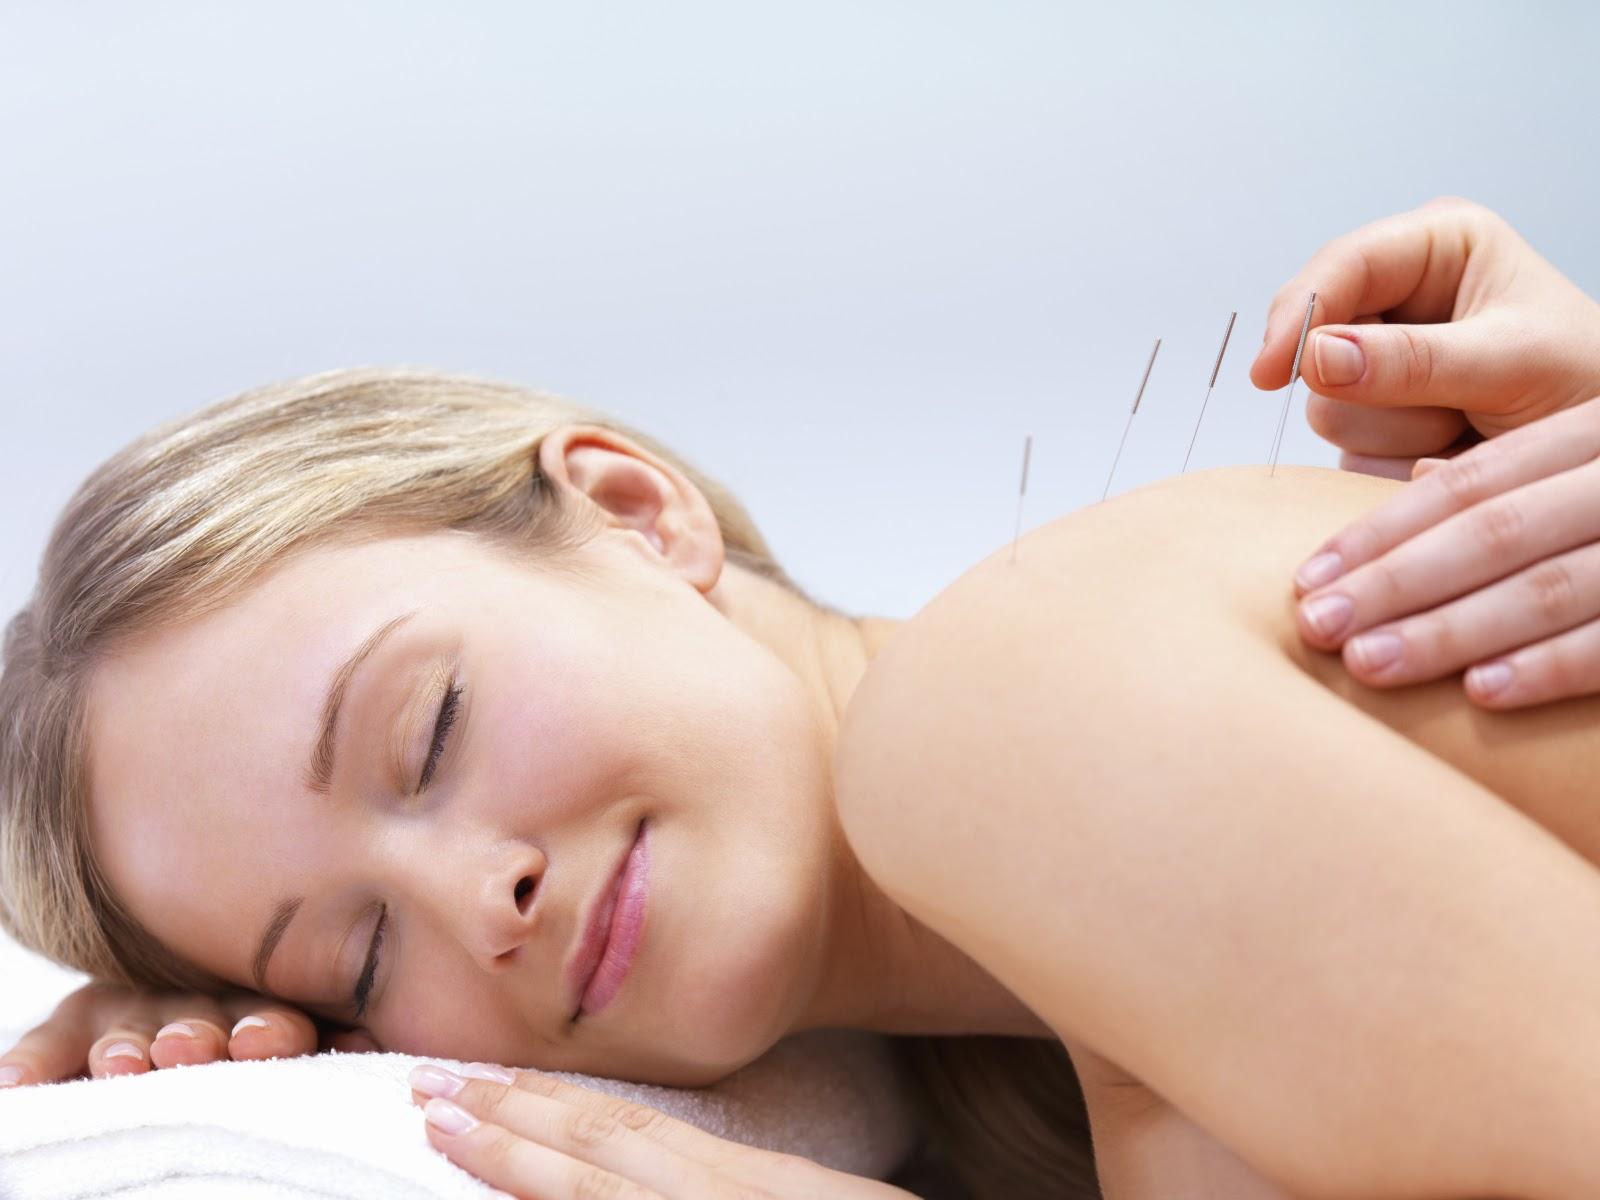 <div class='slider_caption'> <h1>Acupuncture & Wellness Center</h1> <a class='slider-readmore' href='acupuncture'>Read More</a>   </div>